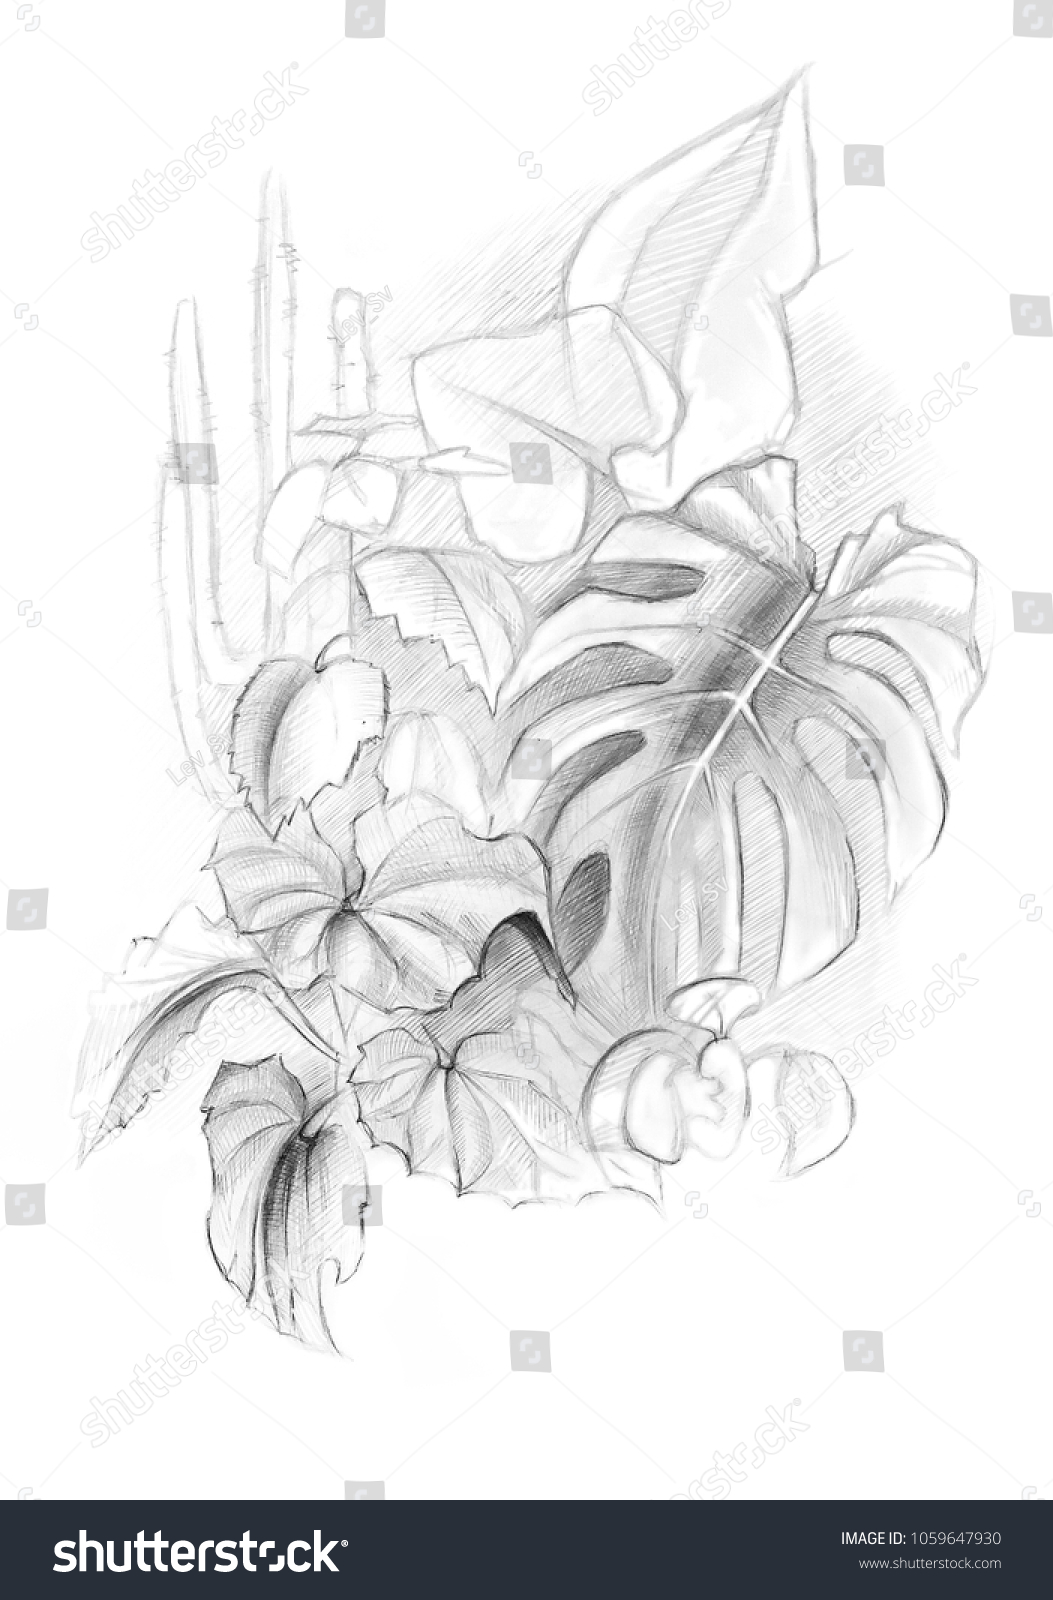 Sketch soft pencil drawing plants stock illustration 1059647930